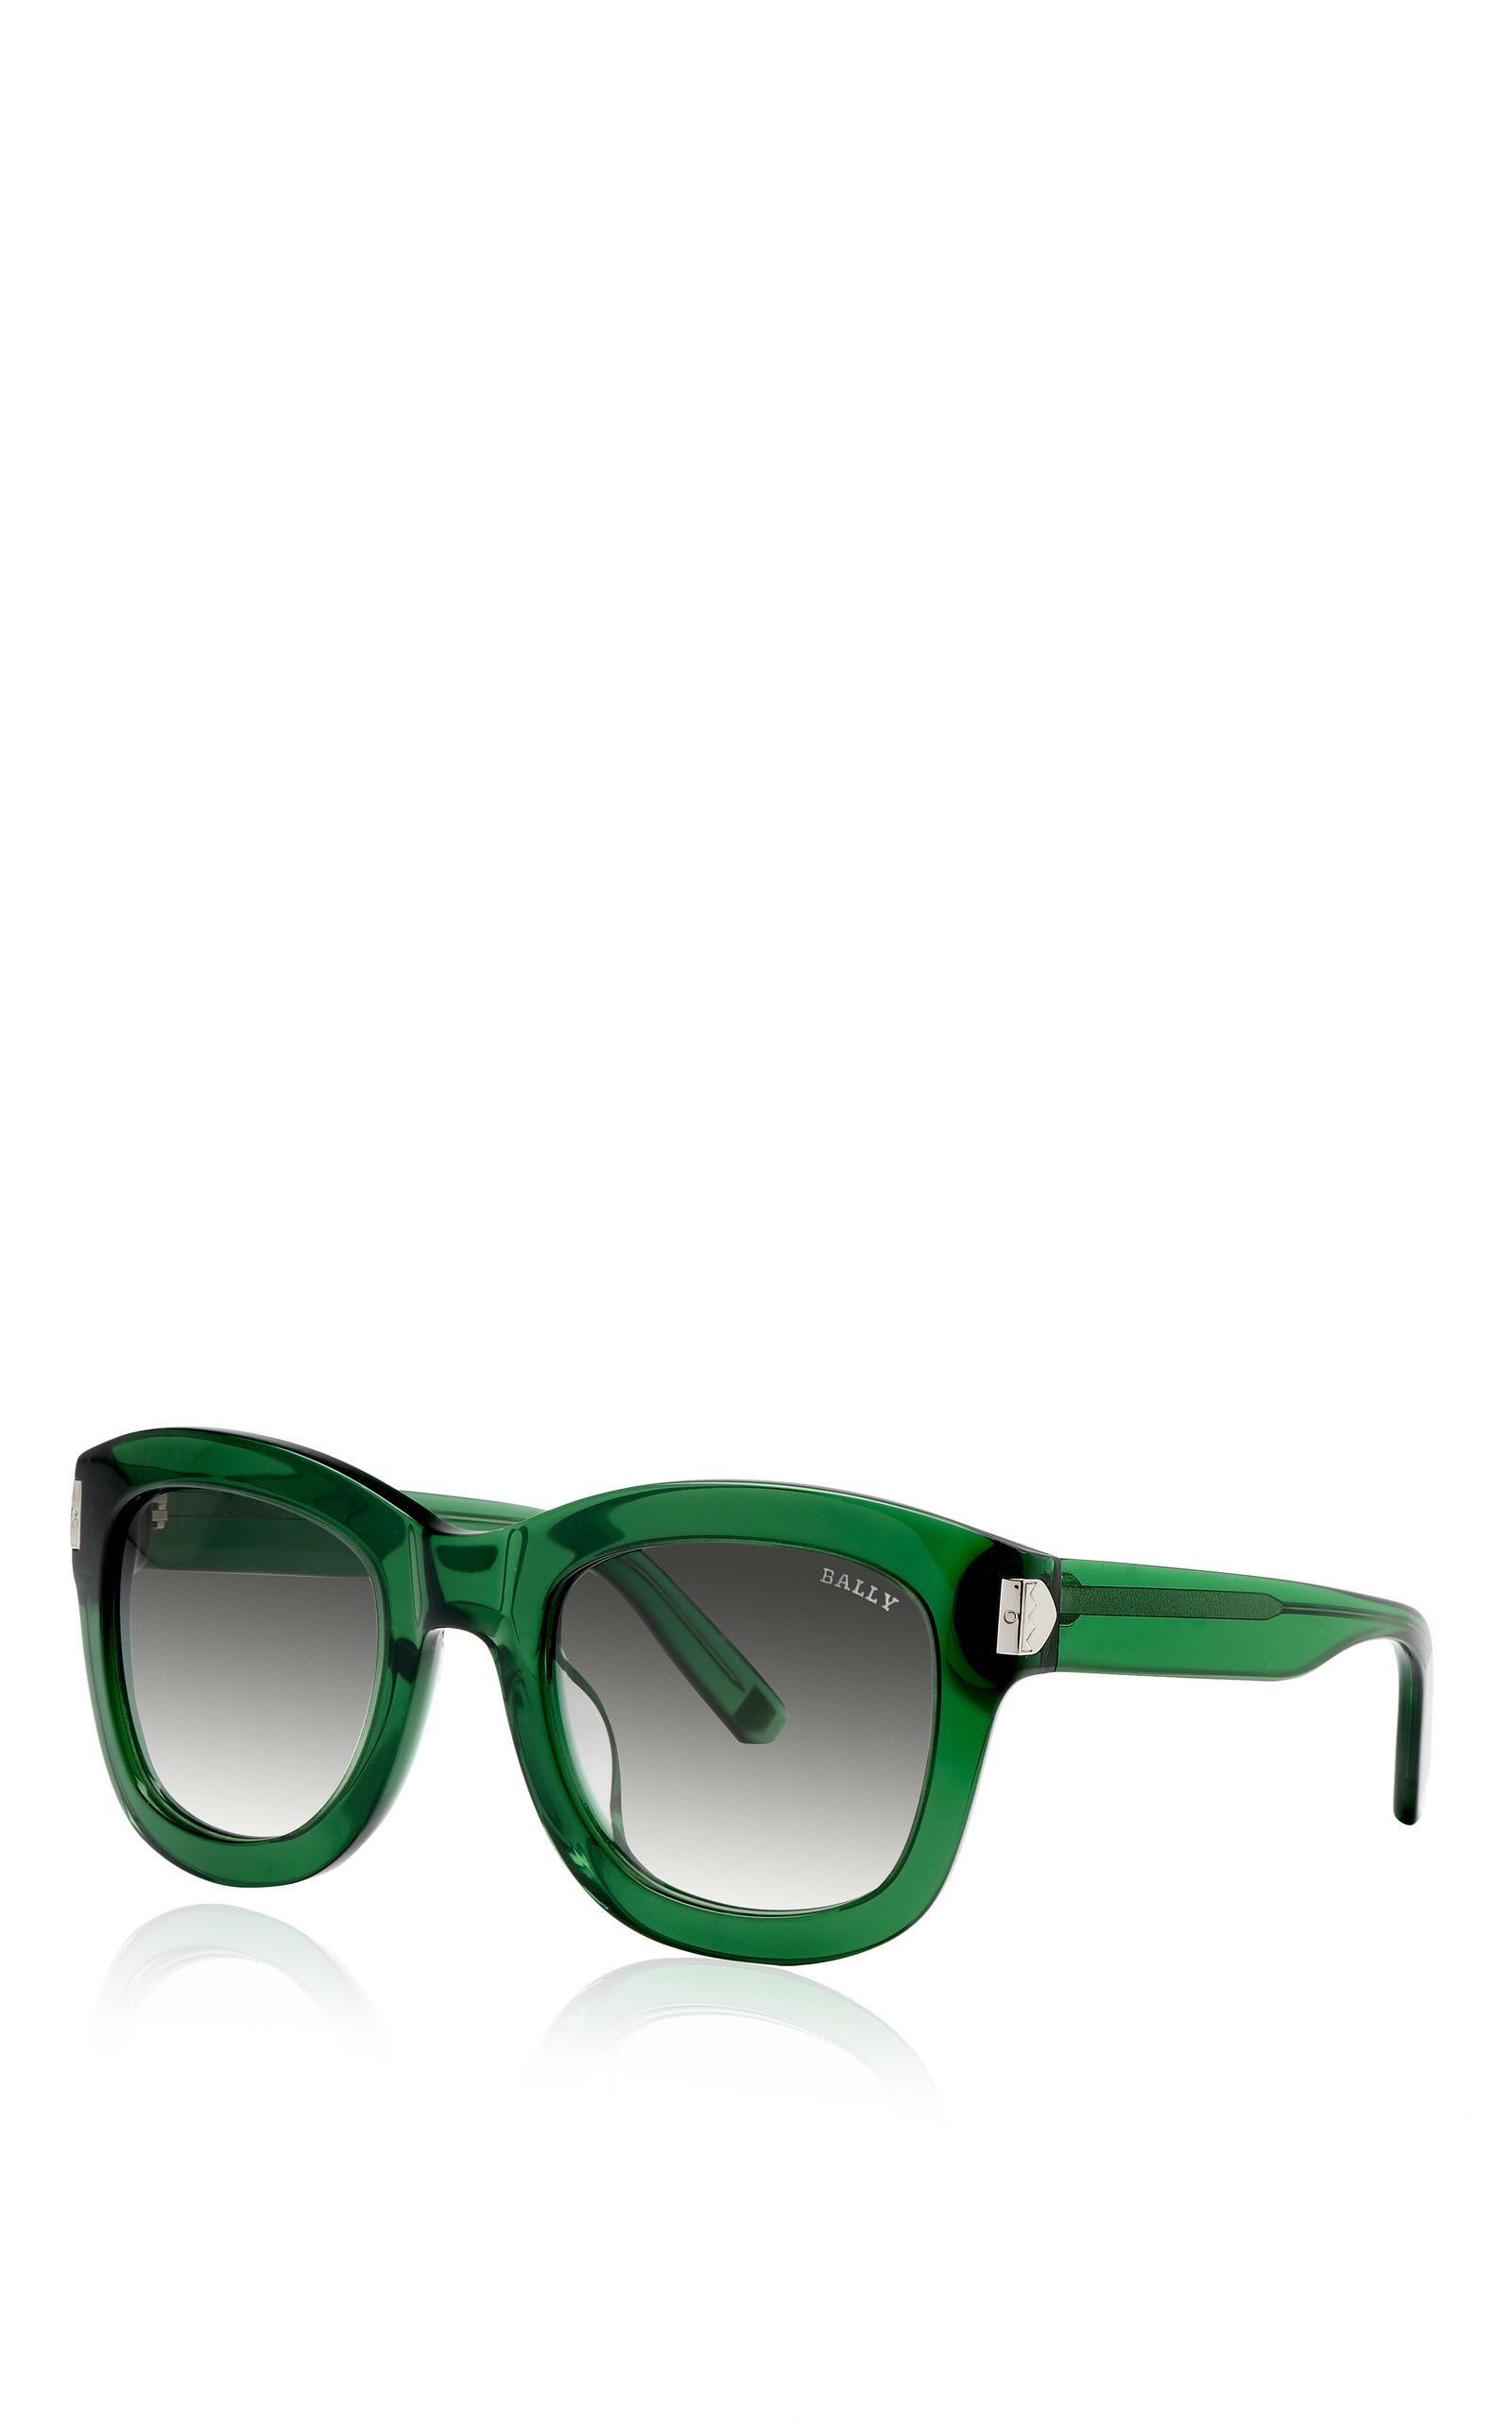 4e1812a0ca Green Acetate Sunglasses by Bally